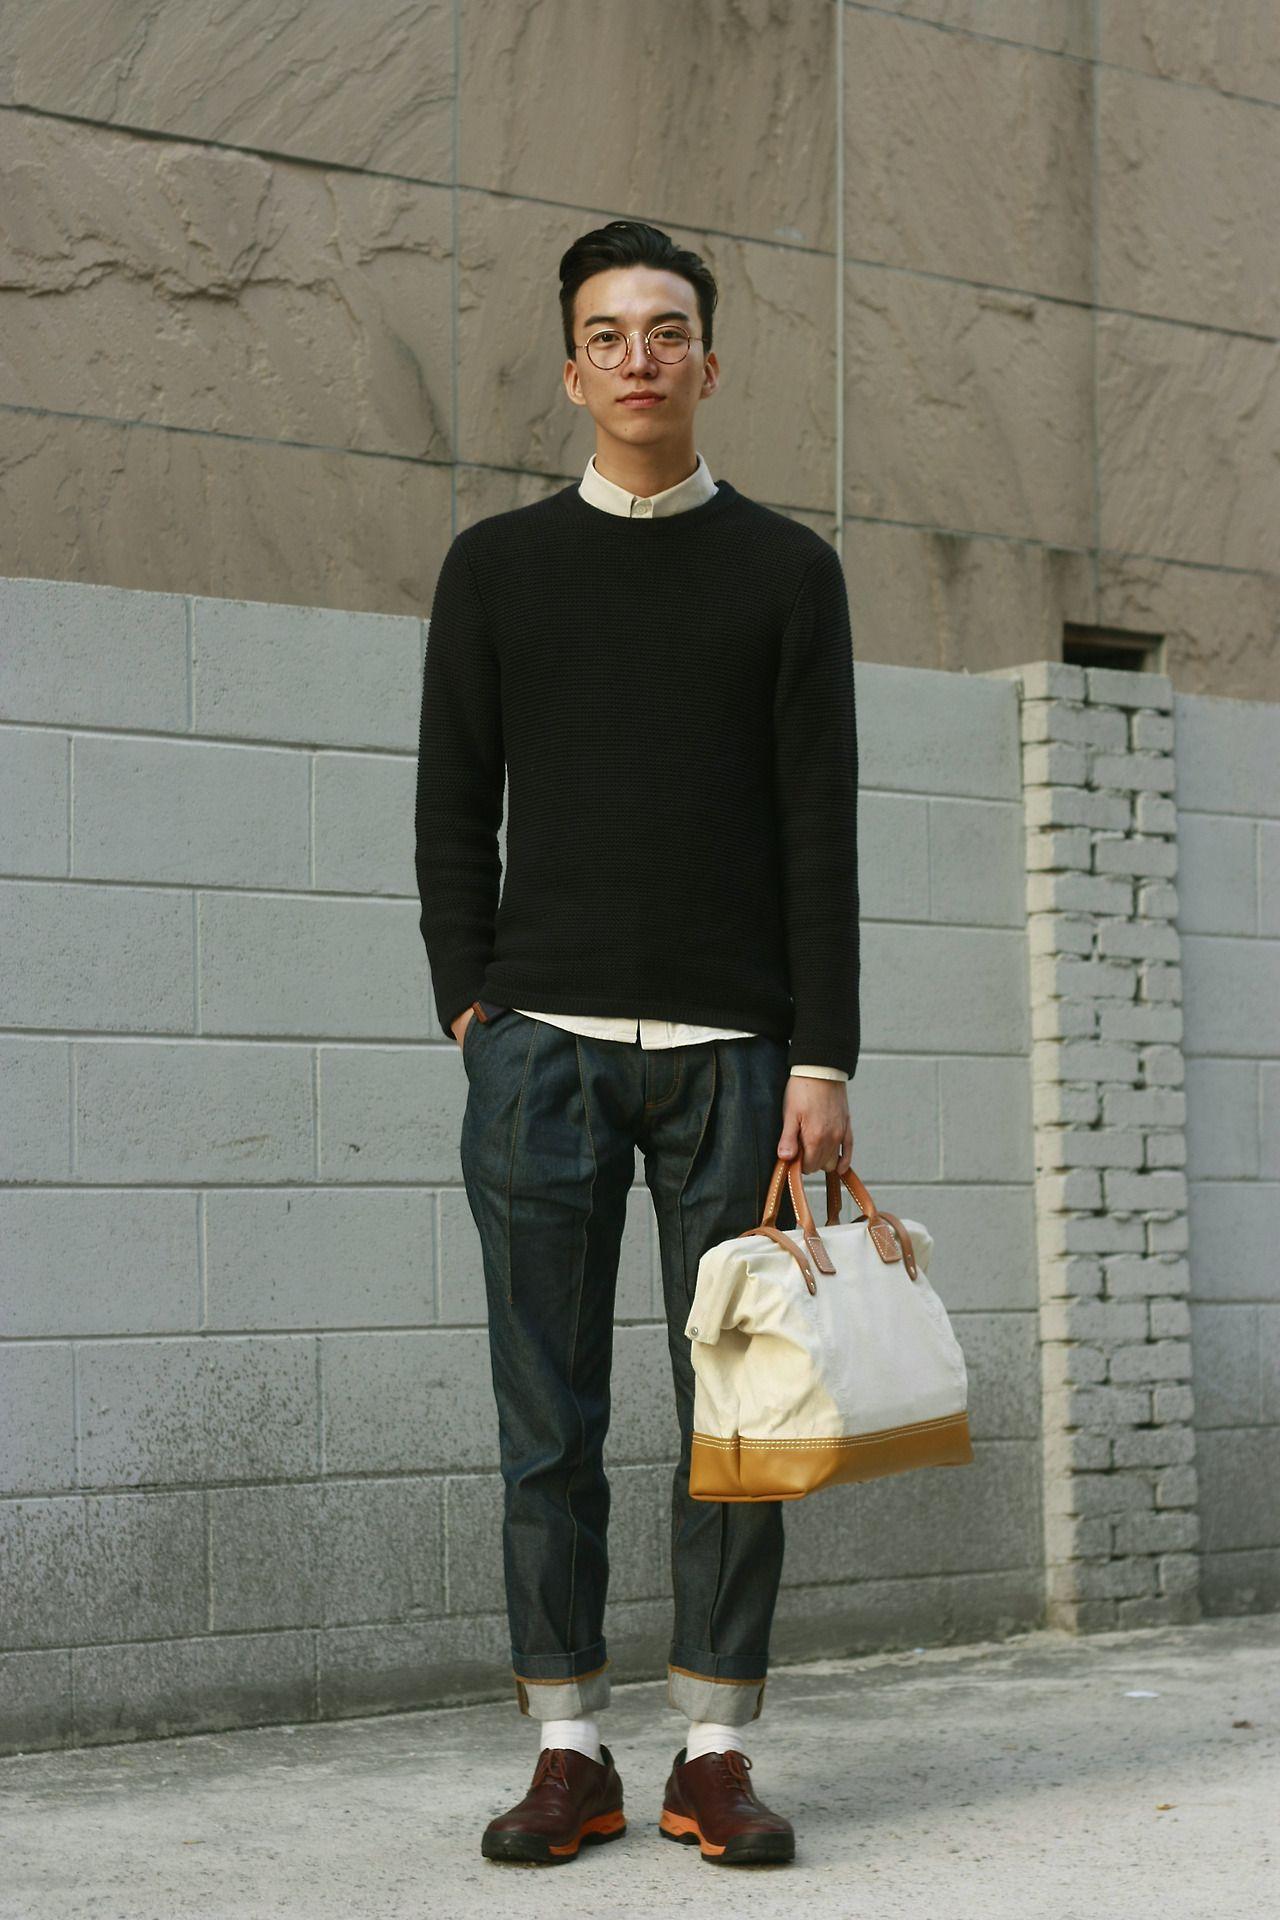 d3c1c73fae1e Smart Look - White shirt + Sweater